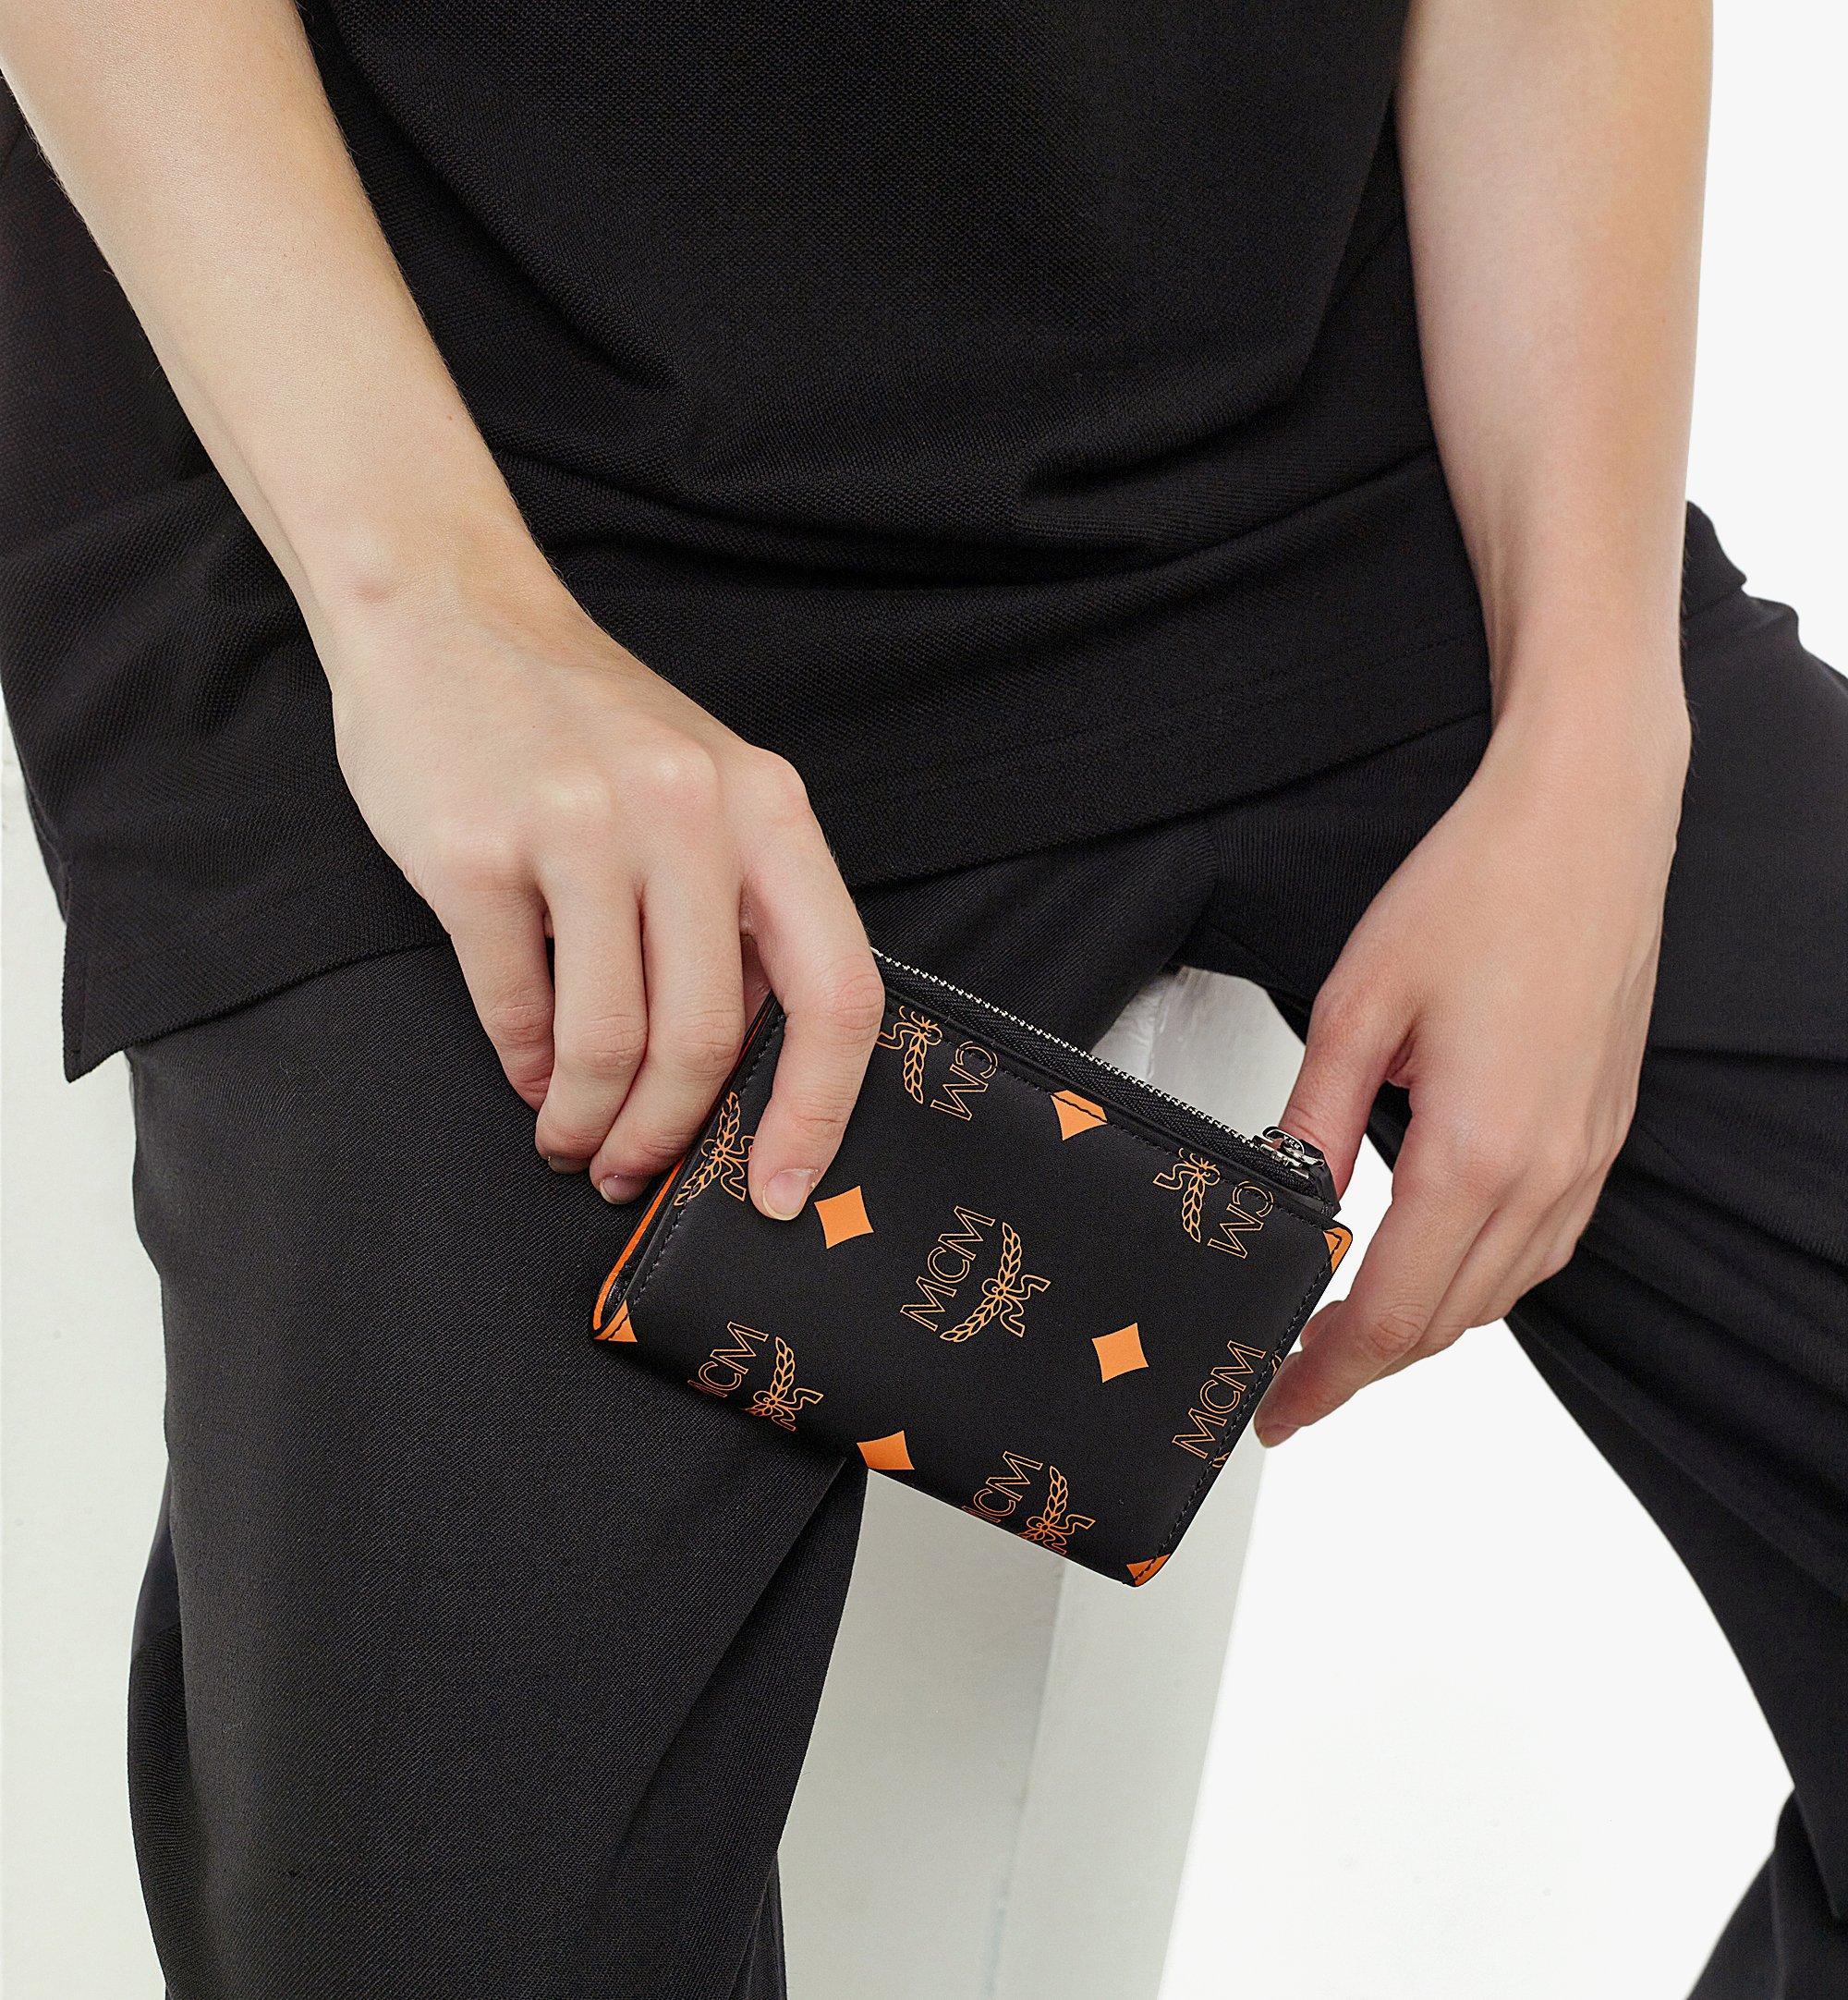 MCM 二つ折りカードウォレット - カラースプラッシュ ヴィセトス Orange MXSBASX02O9001 ほかの角度から見る 2